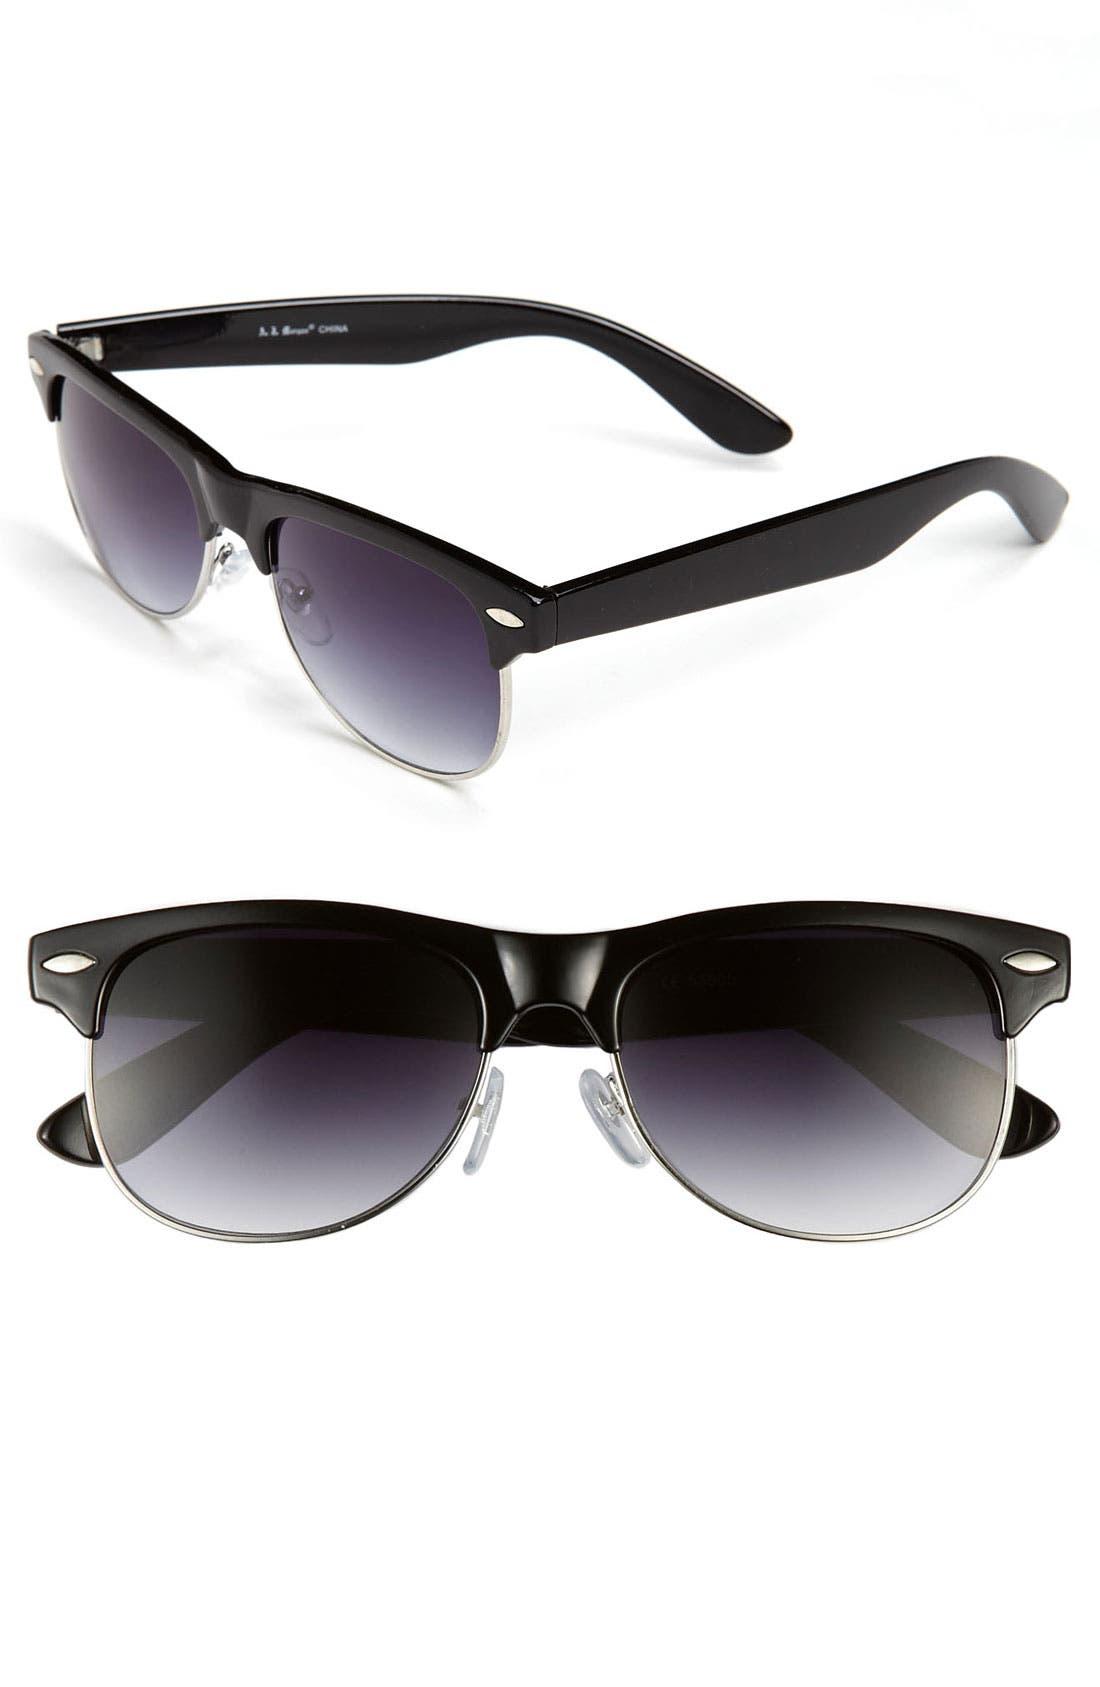 Main Image - A.J. Morgan 57mm Retro Sunglasses